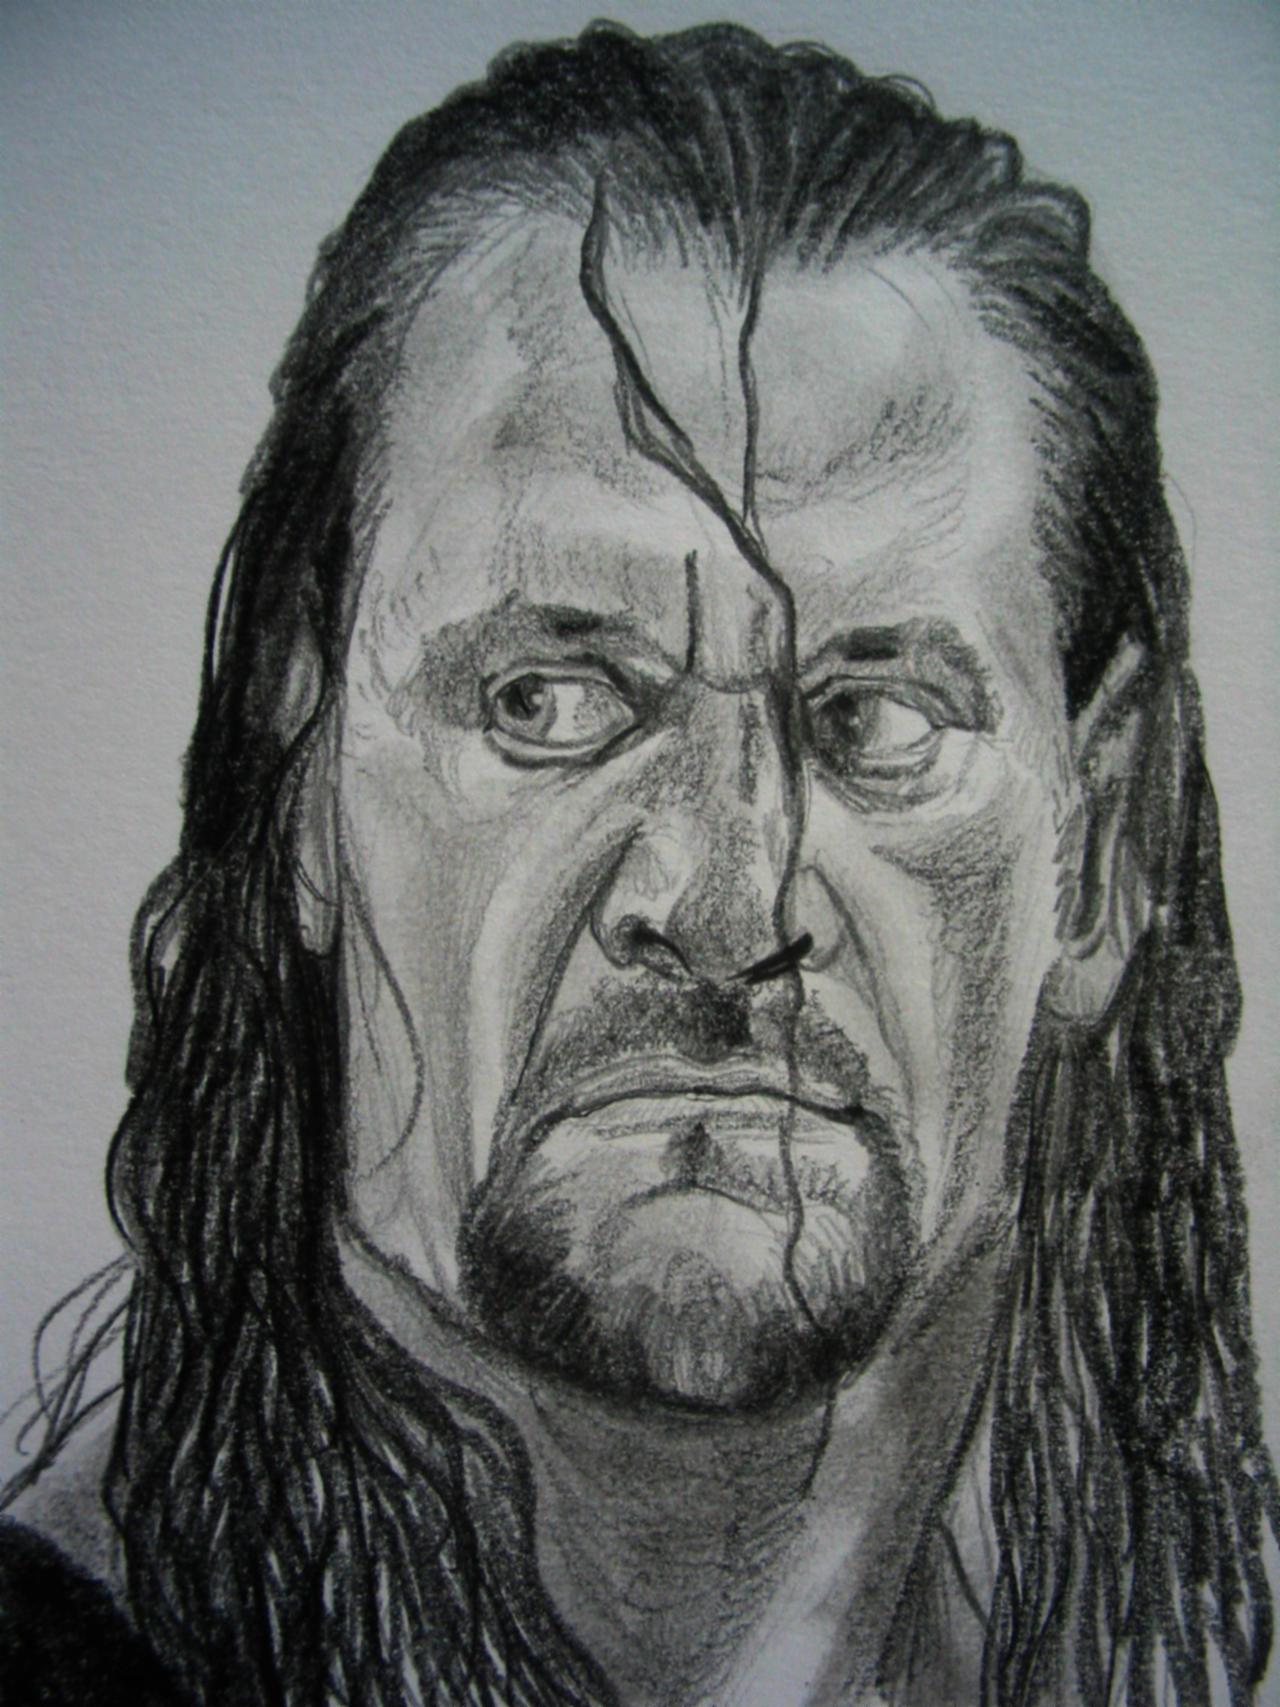 Wwe The Undertaker 1990s Undertaker 16-0 by vinceart